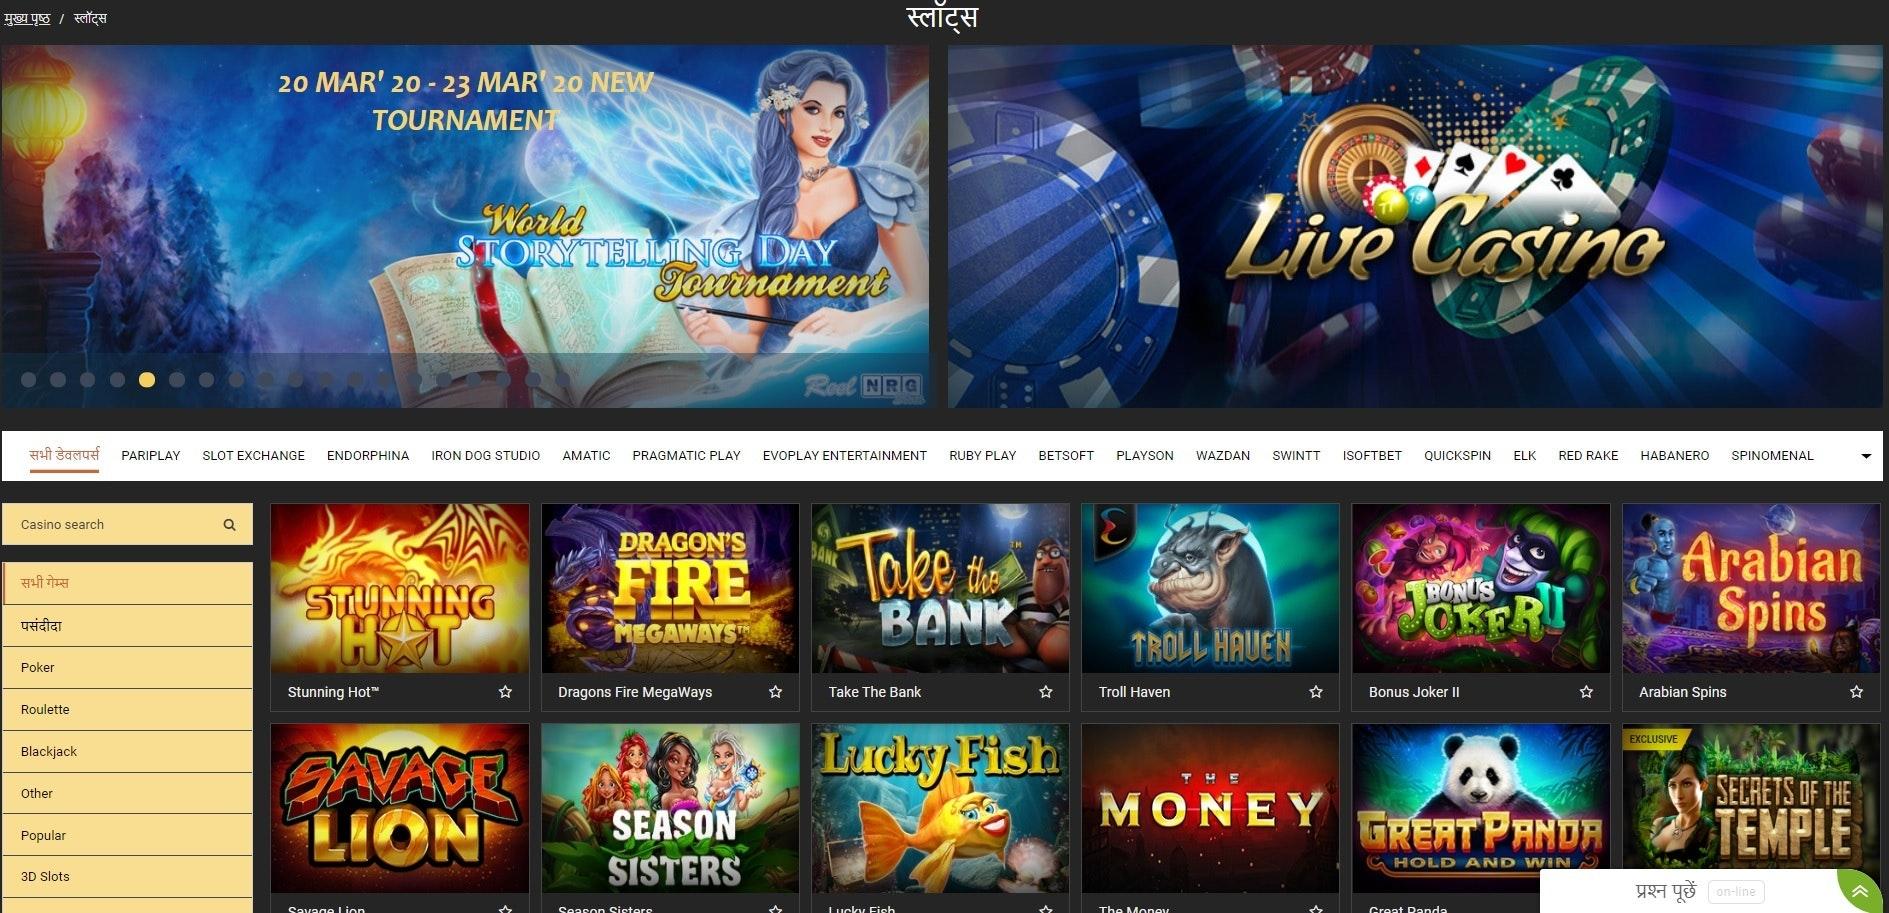 Different Online Gambling Sites - Gambling